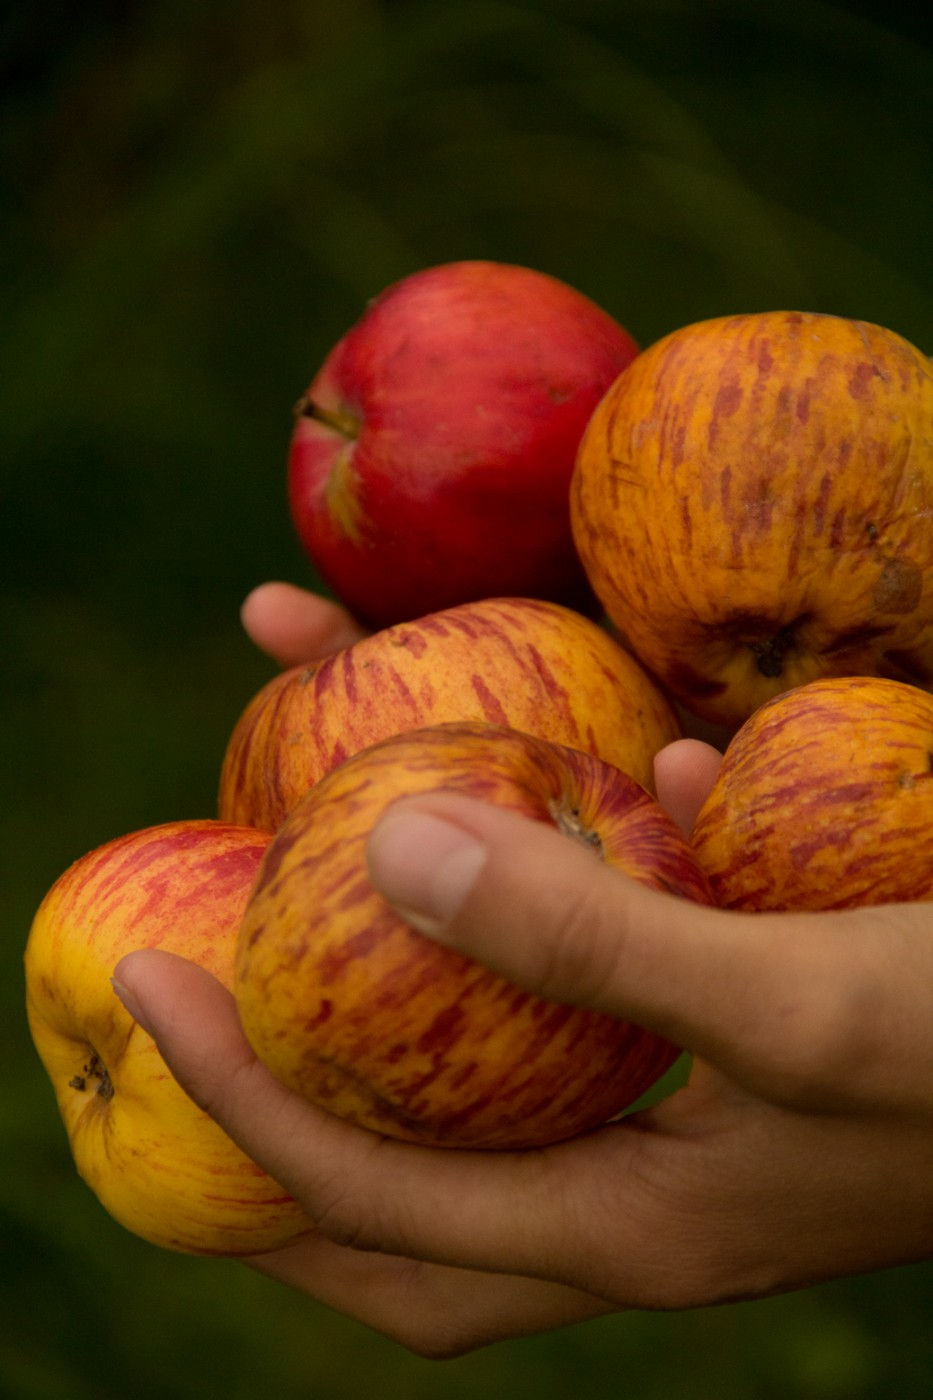 Tausendsassa Apfelessig